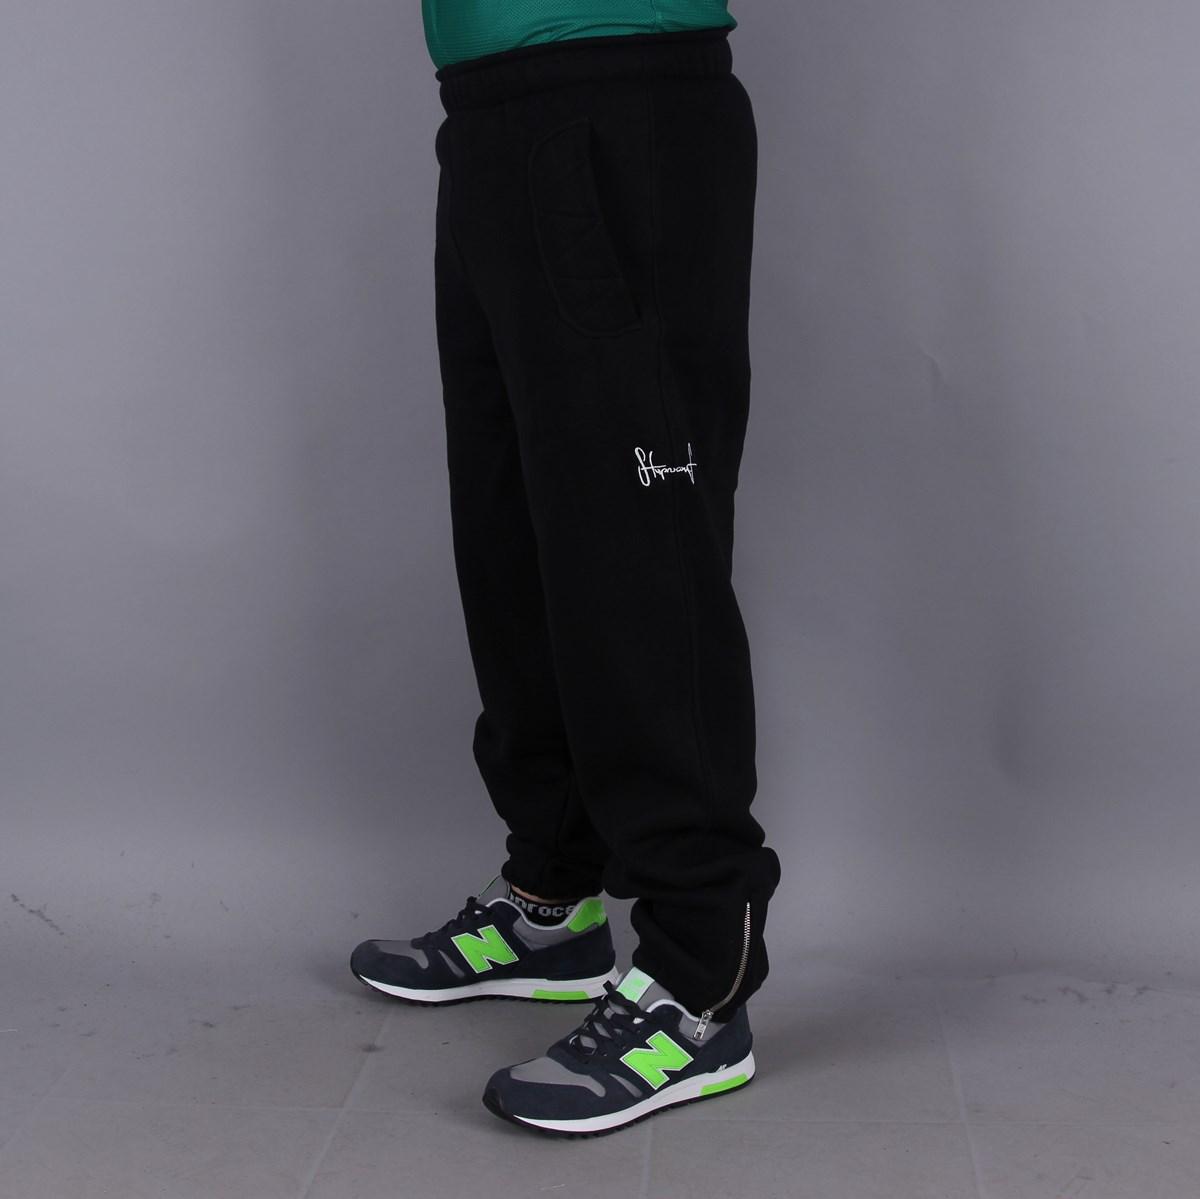 9297519d03 Spodnie Dresowe Stoprocent DM Smalltag Black